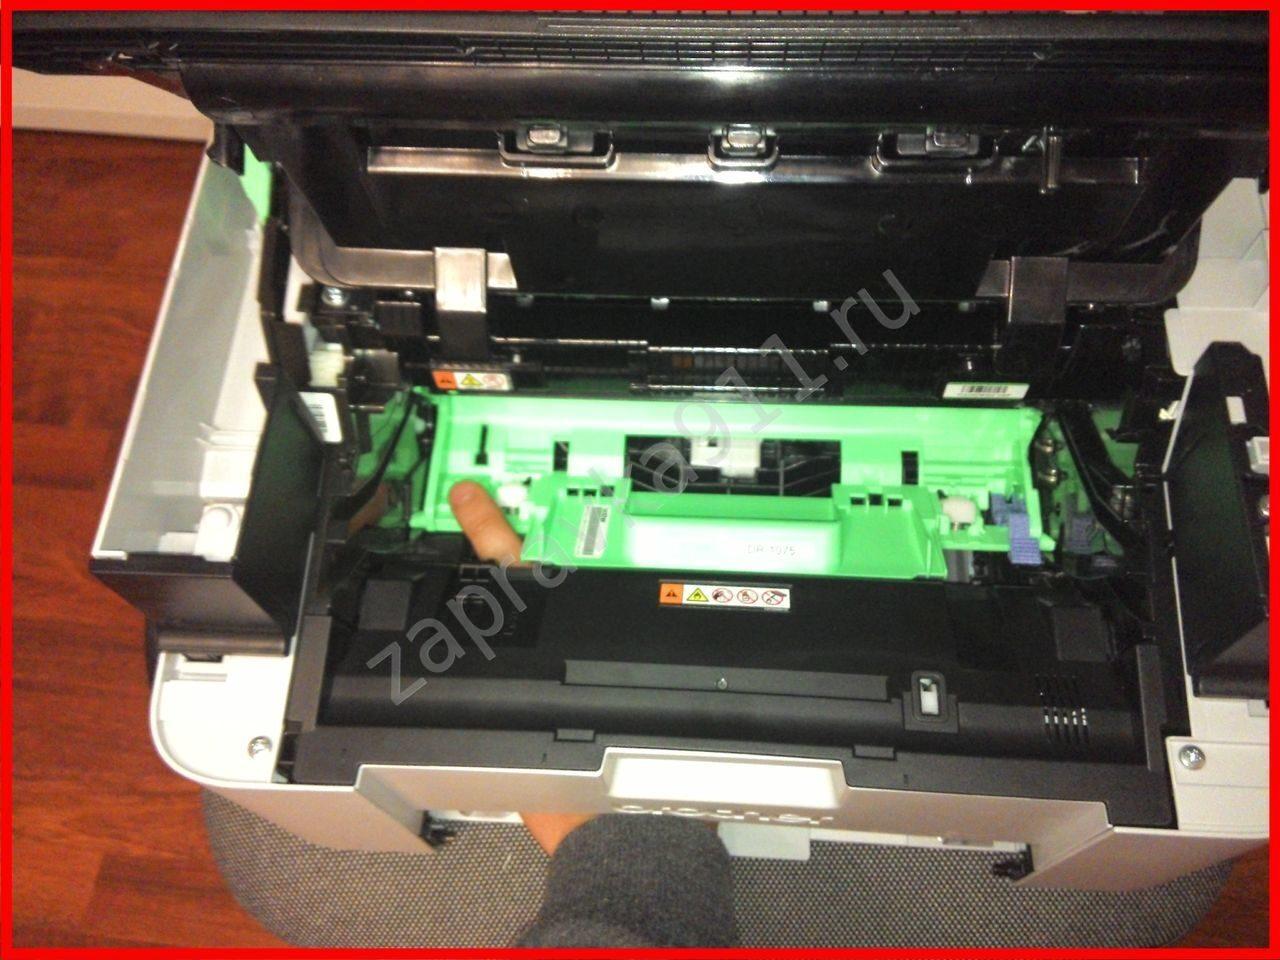 инструкция по заправке картриджа xerox phaser 5550